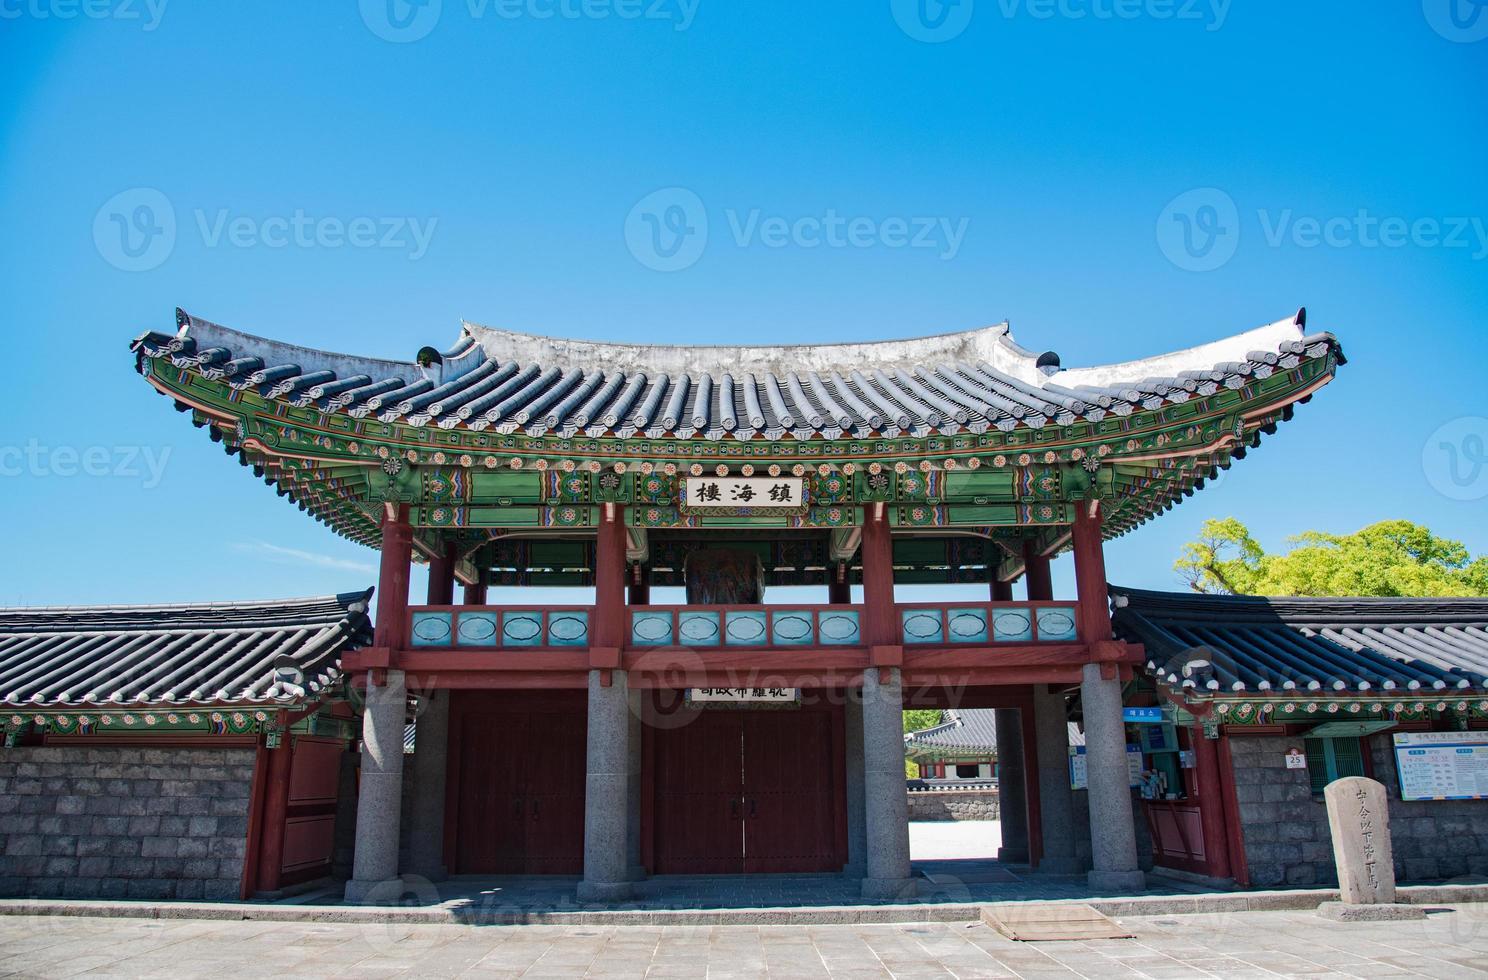 gwandeokjeong paviljong, Jeju Island, Korea foto